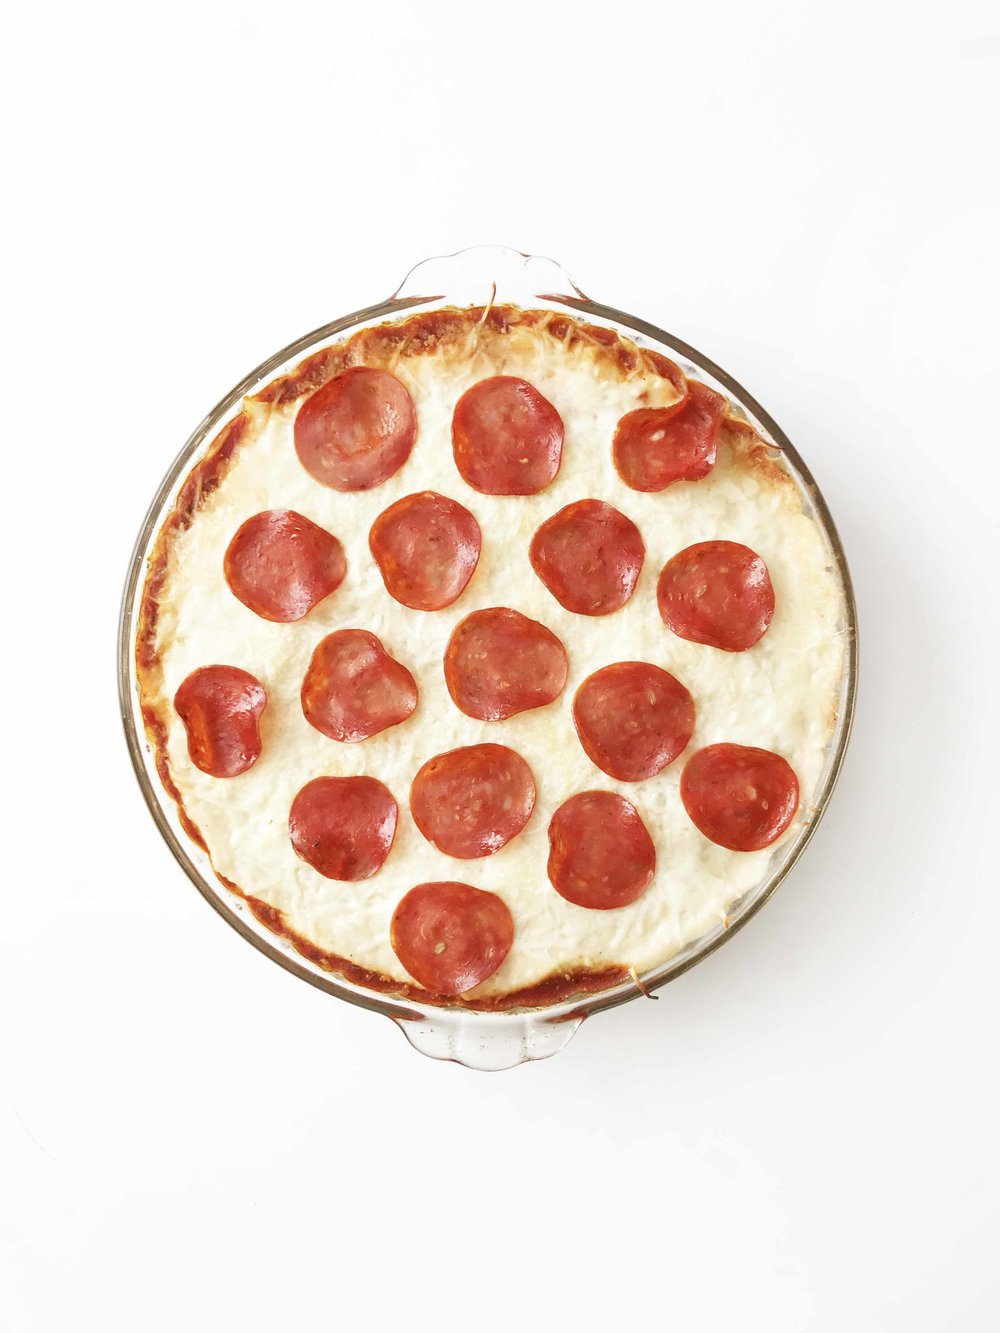 cauliflower-pizza-dip8.jpg